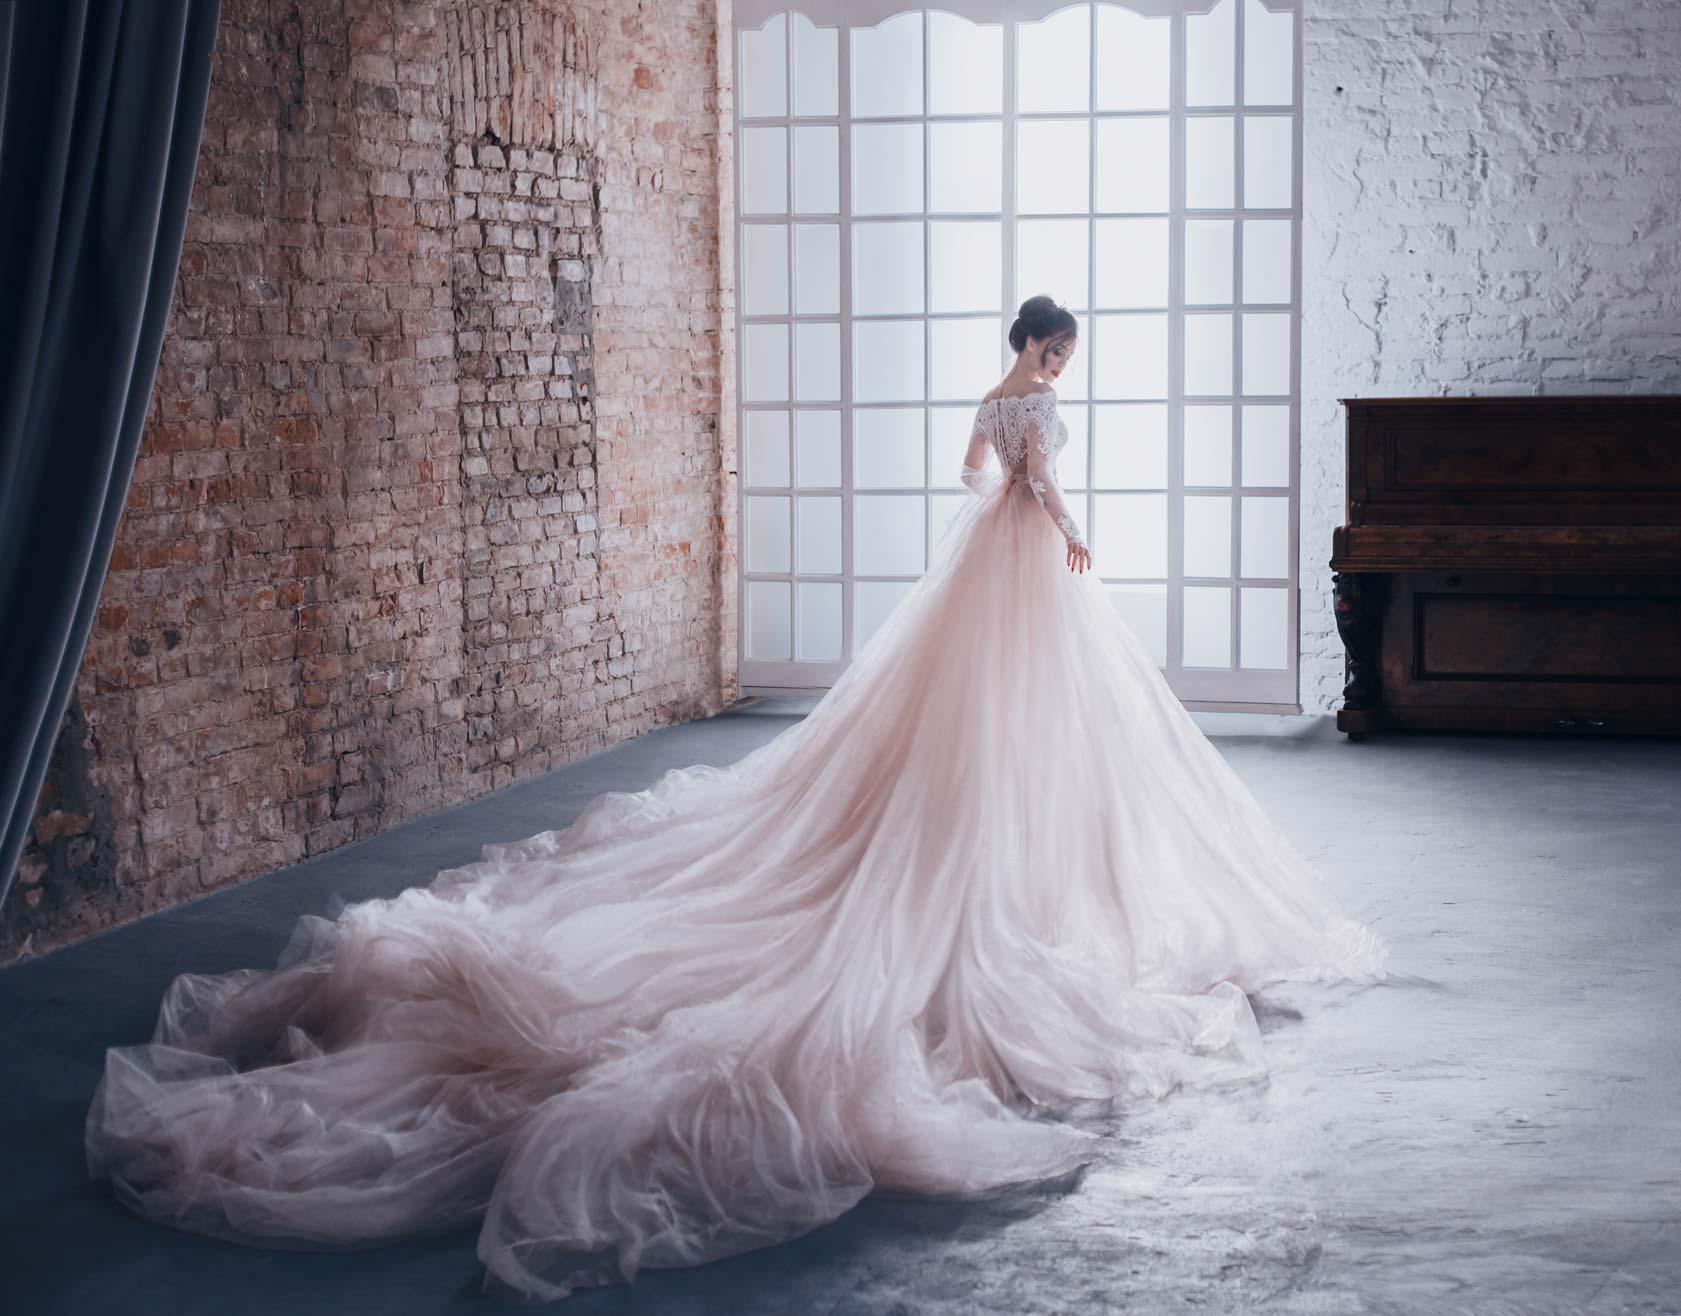 Top 10 Wedding Dress Styles Every Bride Will Like